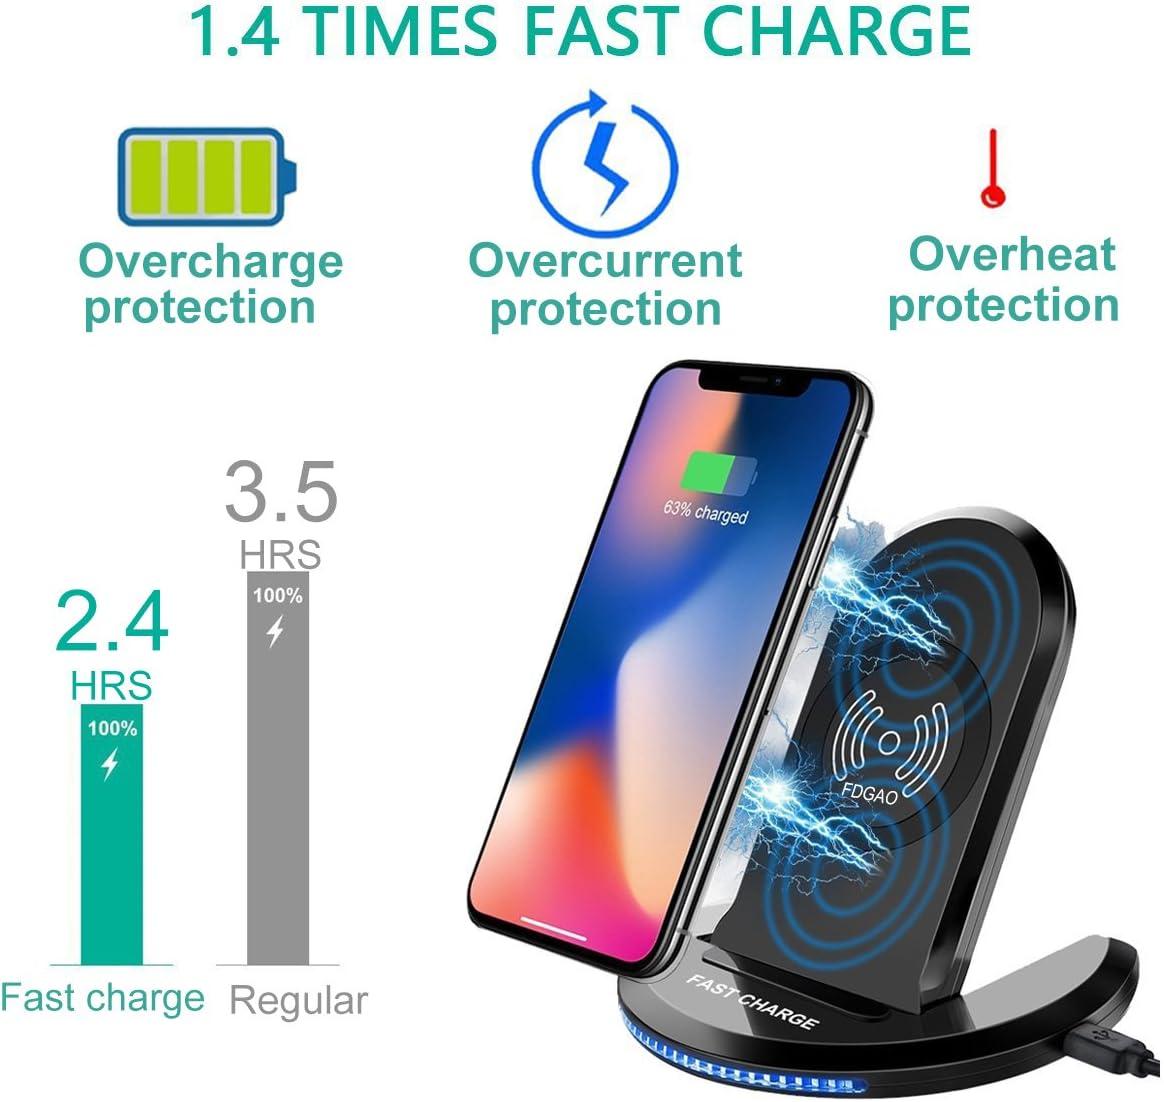 Fdgao chargeur sans fil rapide, Induction chargeurs 2 coil